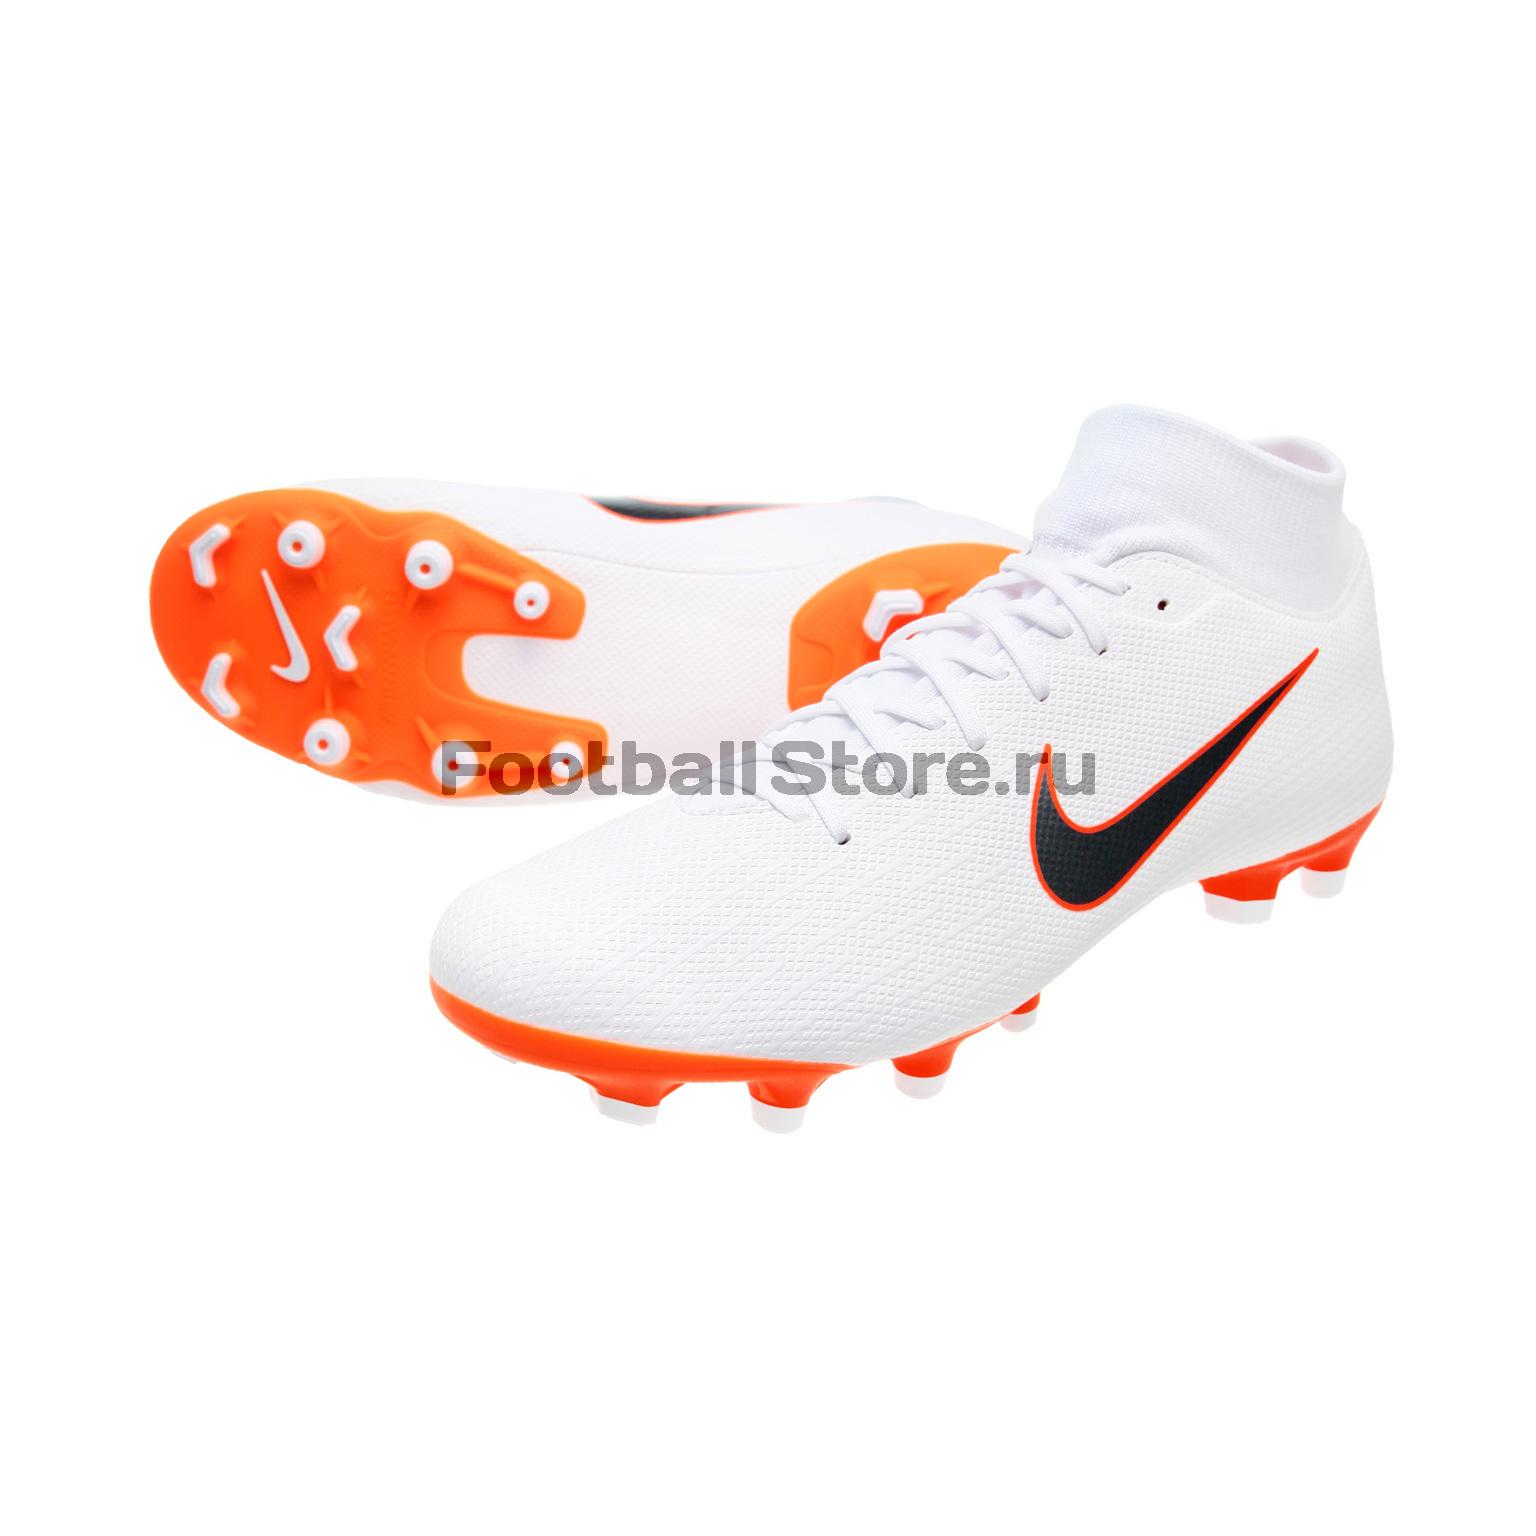 Бутсы Nike Superfly 6 Academy FG/MG AH7362-107 бутсы детские nike superfly 6 elite fg ah7340 107